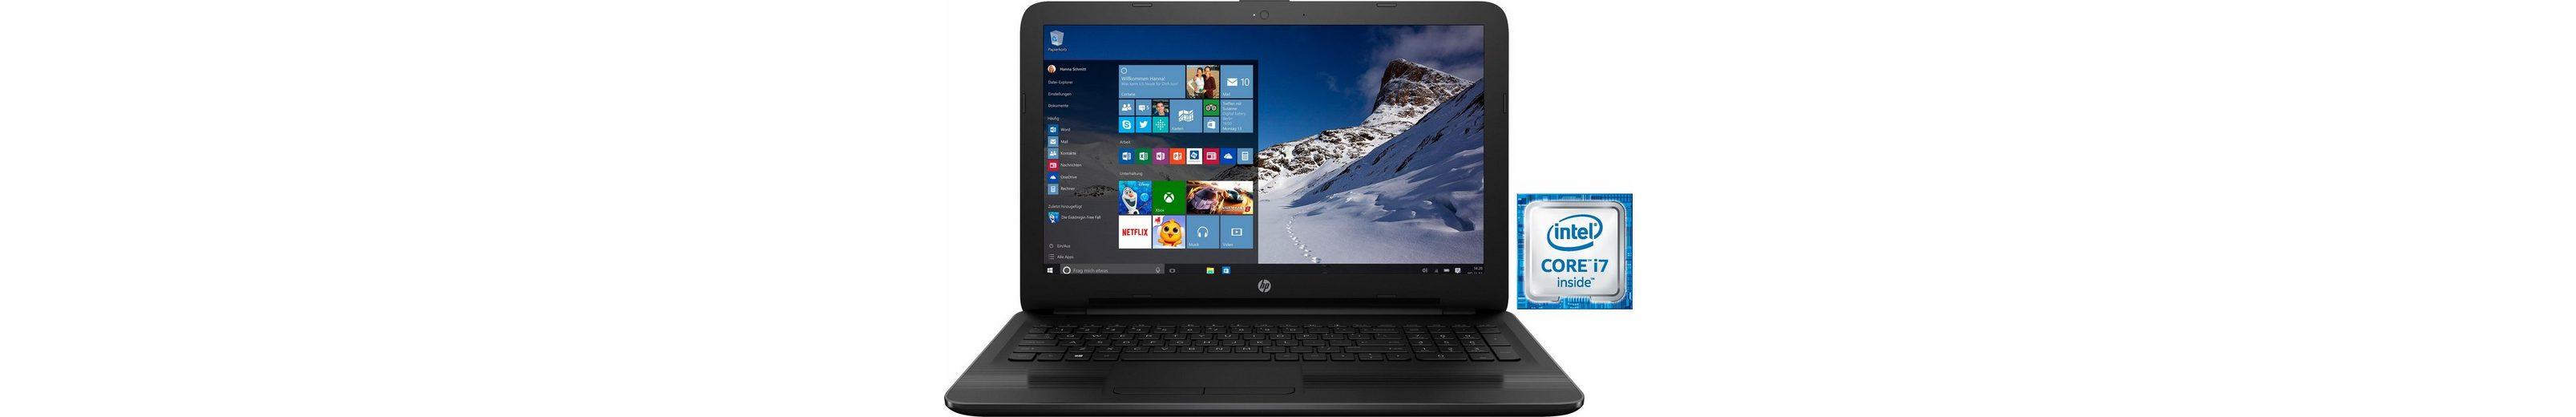 HP 17-x112ng Notebook, Intel® Core™ i7, 43,9 cm (17,3 Zoll), 1000 GB Speicher, 8192 MB DDR4-SDRAM